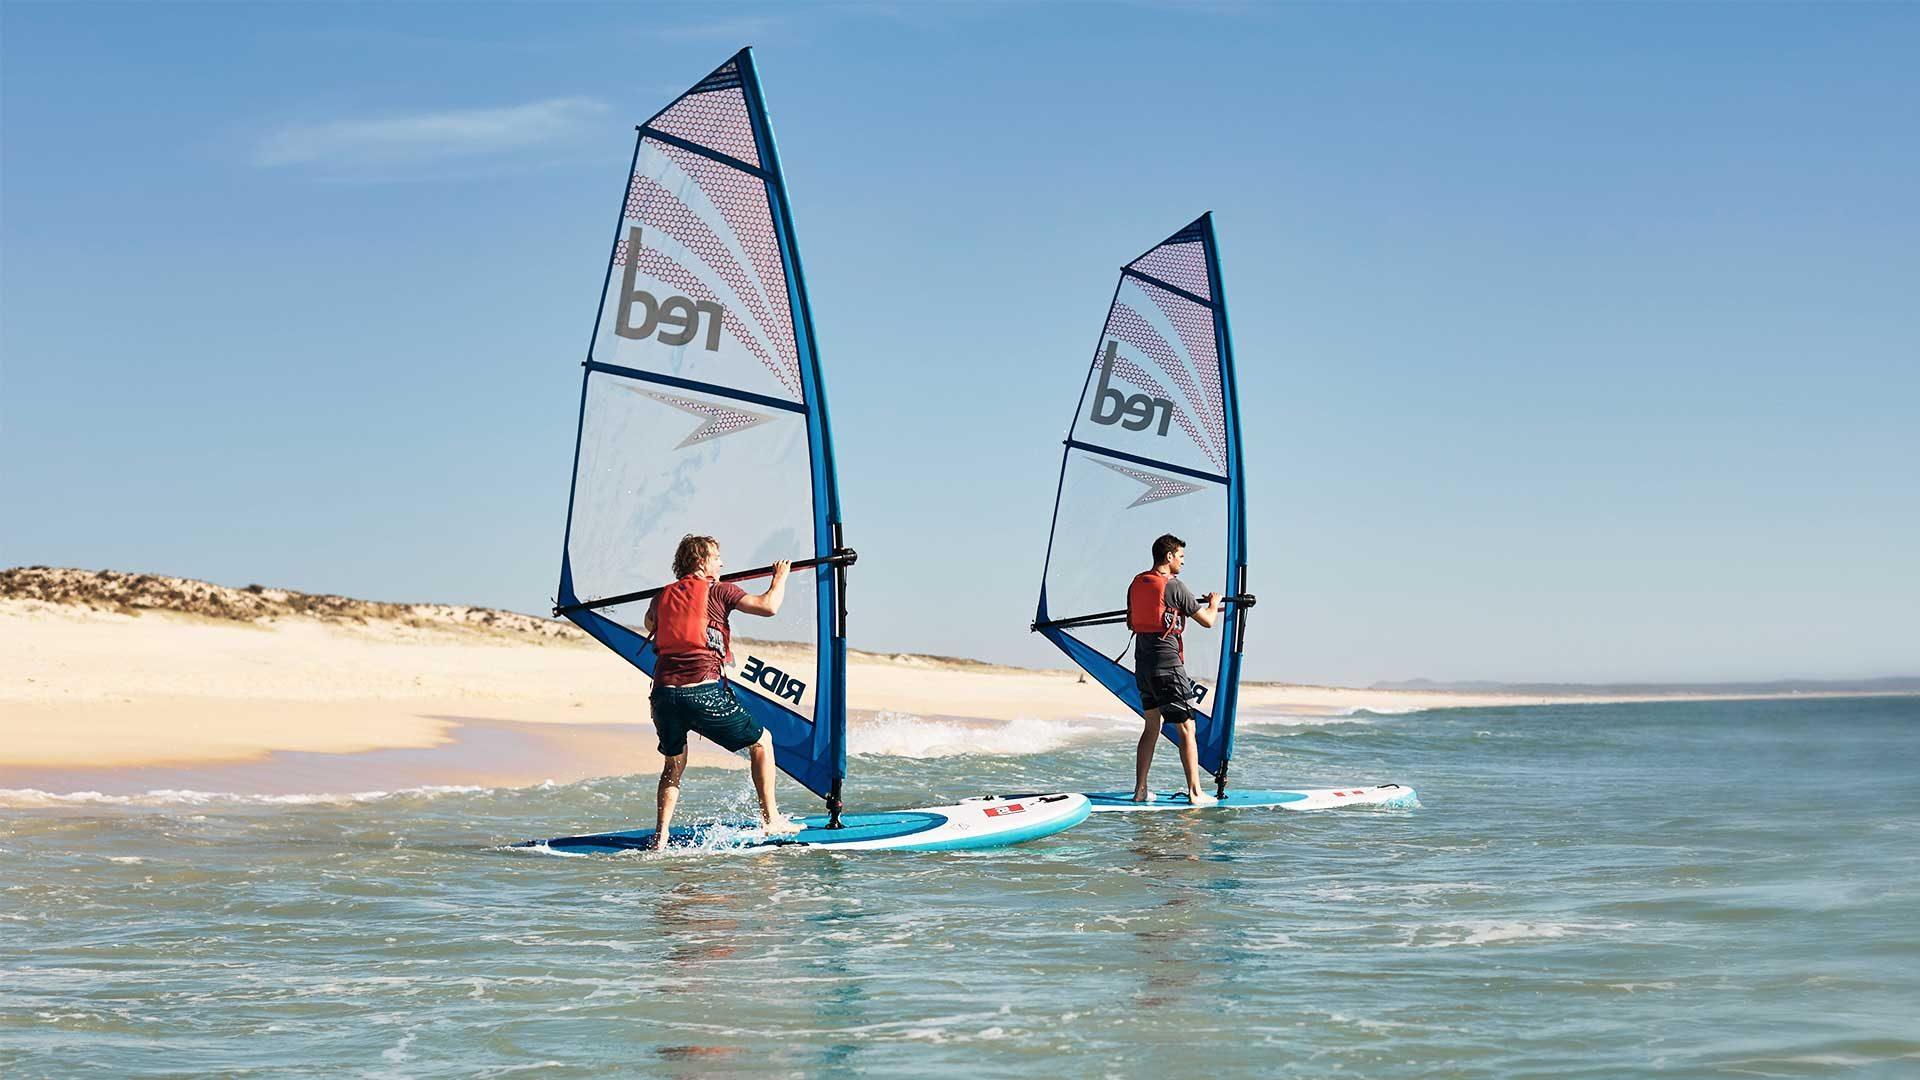 redpaddleco-107-windsurf-inflatable-paddle-board-desktop-gallery-1